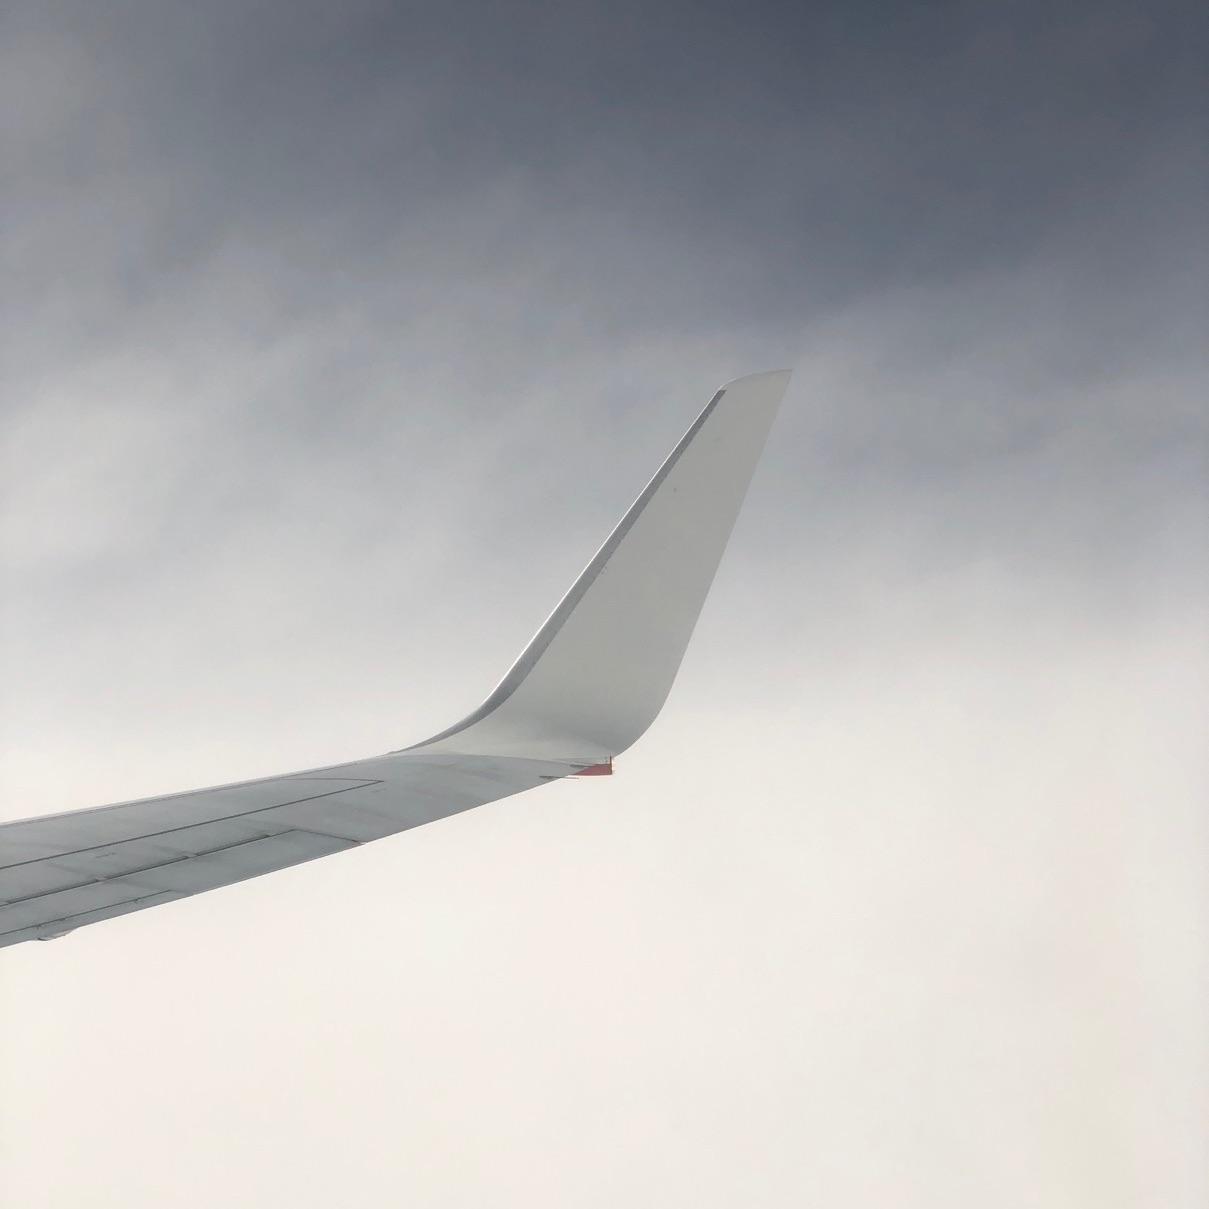 plane-wing-4.jpg